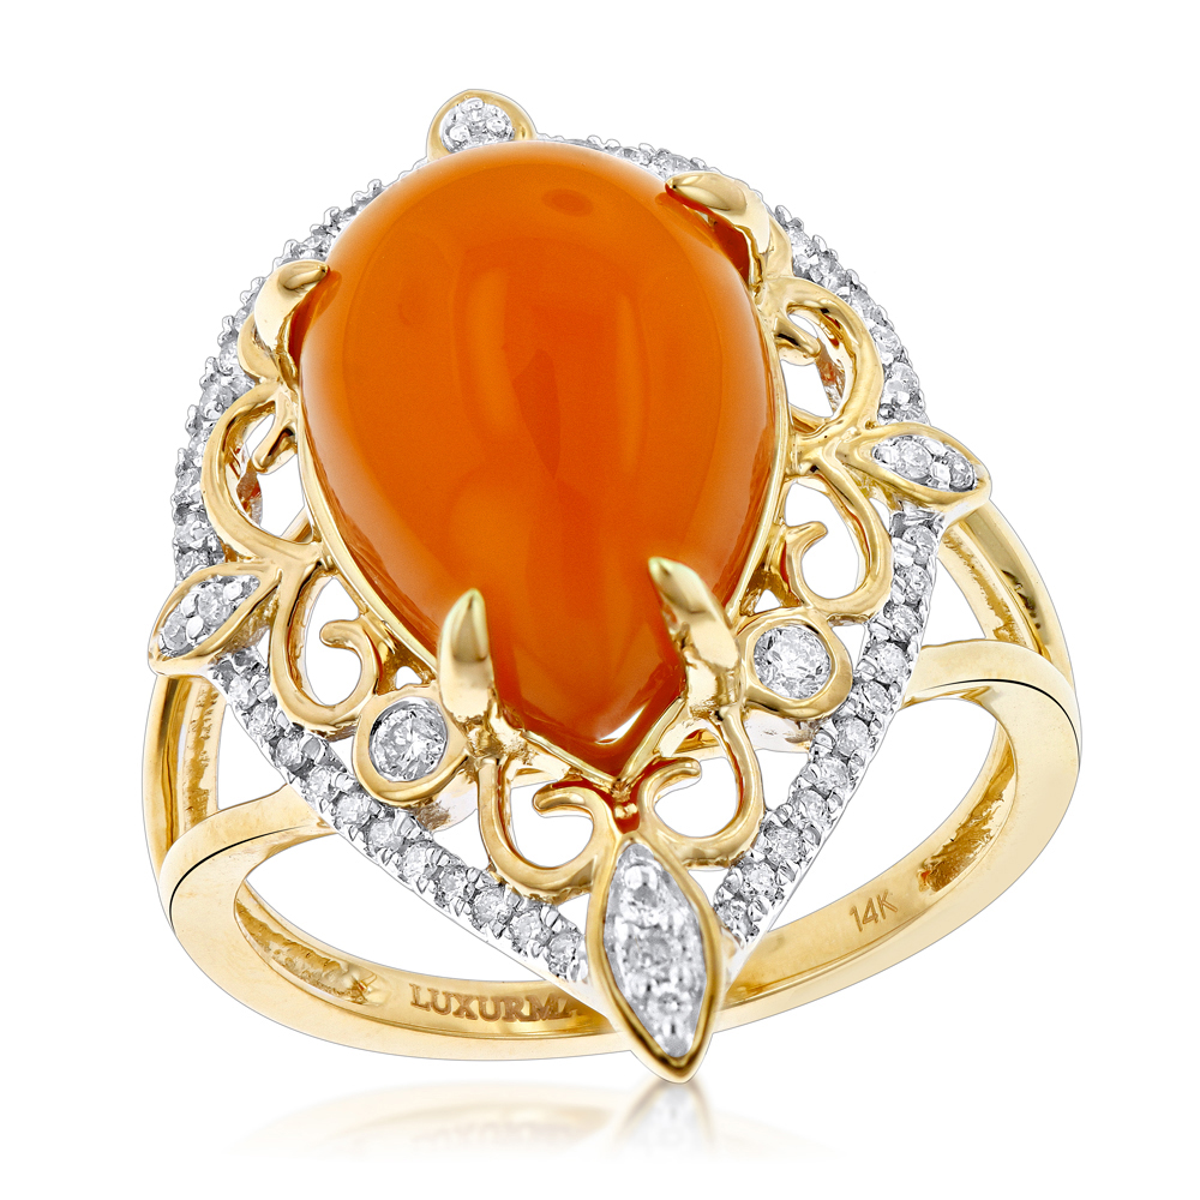 Gemstone Jewelry: Orange Aventurine Diamond Ring 5ct 14K